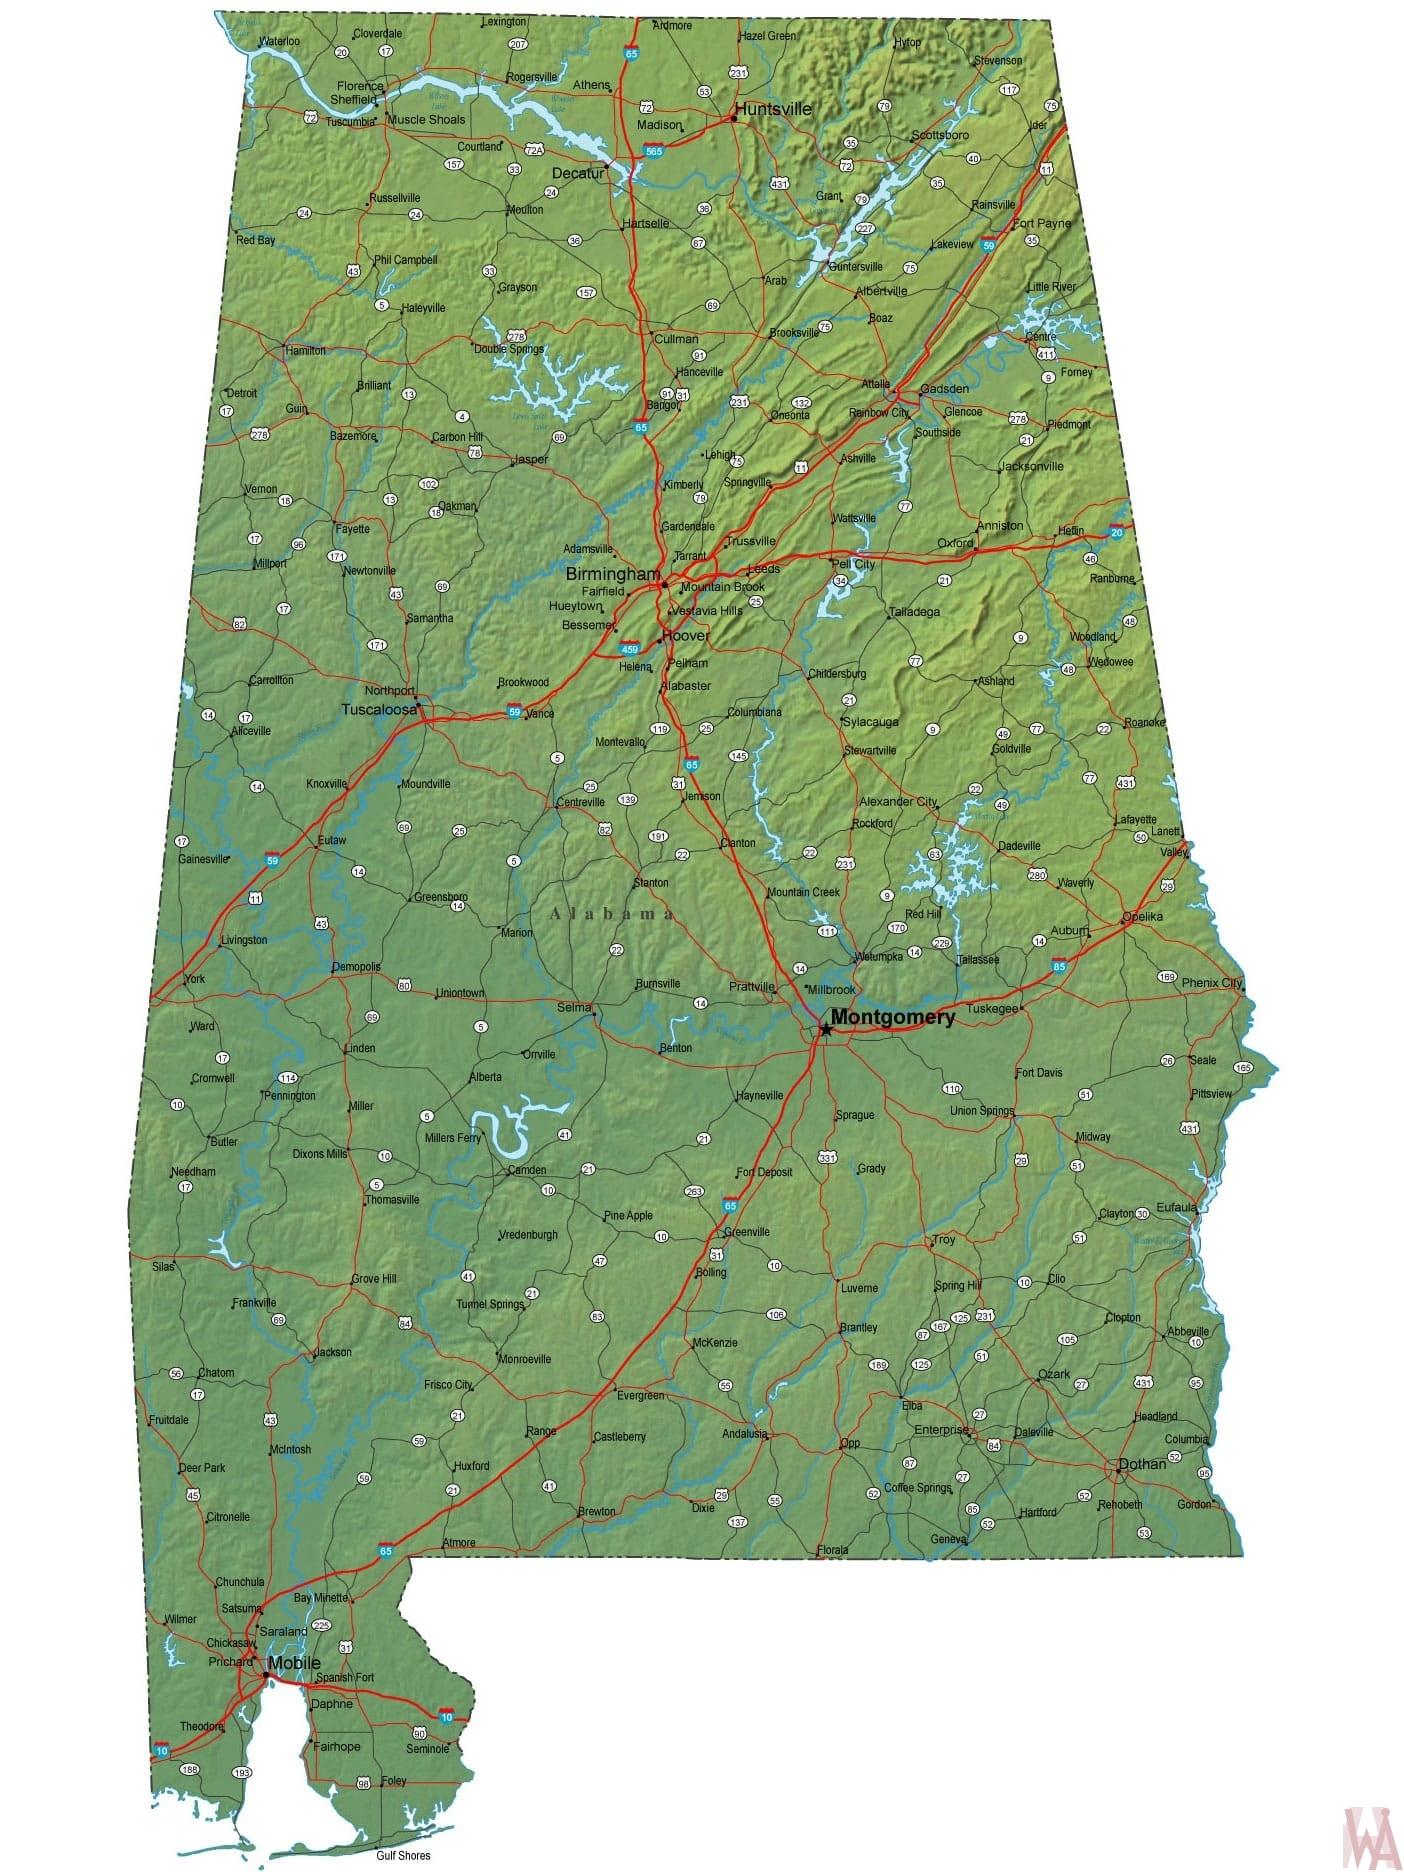 Alabama High Resolution  Physical  Map  | High Resolution Physical  Map of Alabama